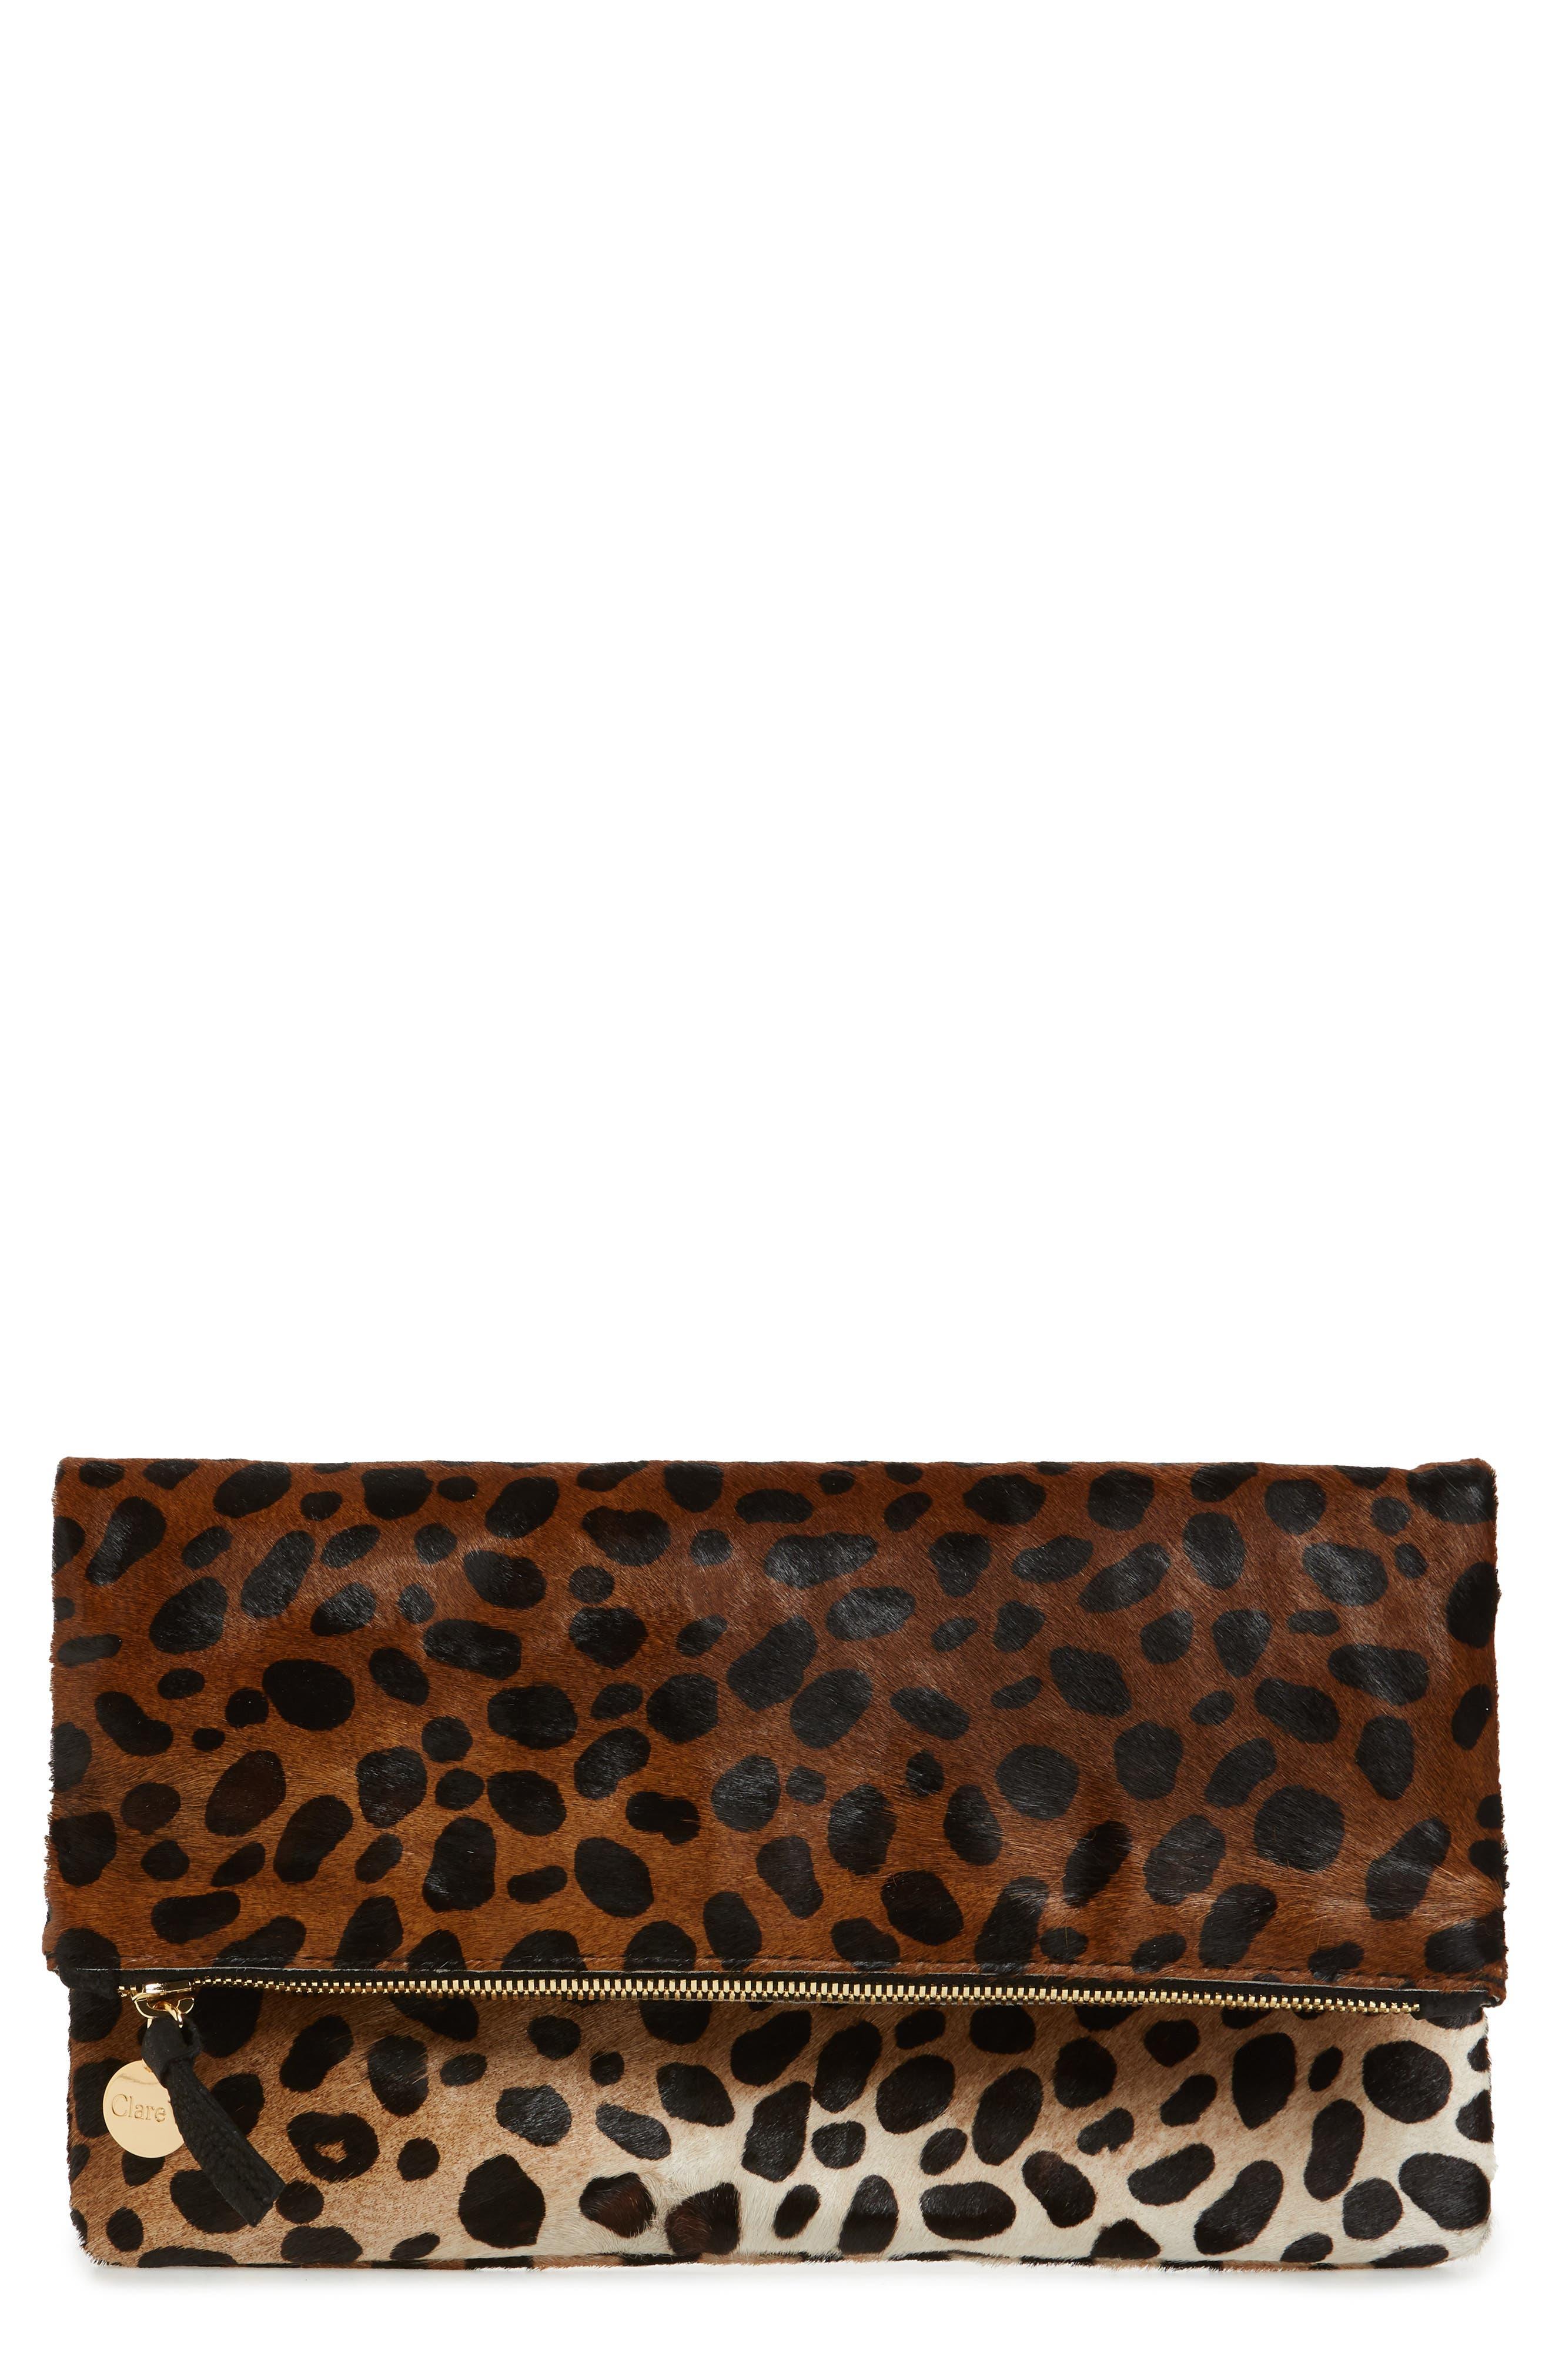 Genuine Calf Hair Leopard Print Foldover Clutch, Main, color, 203